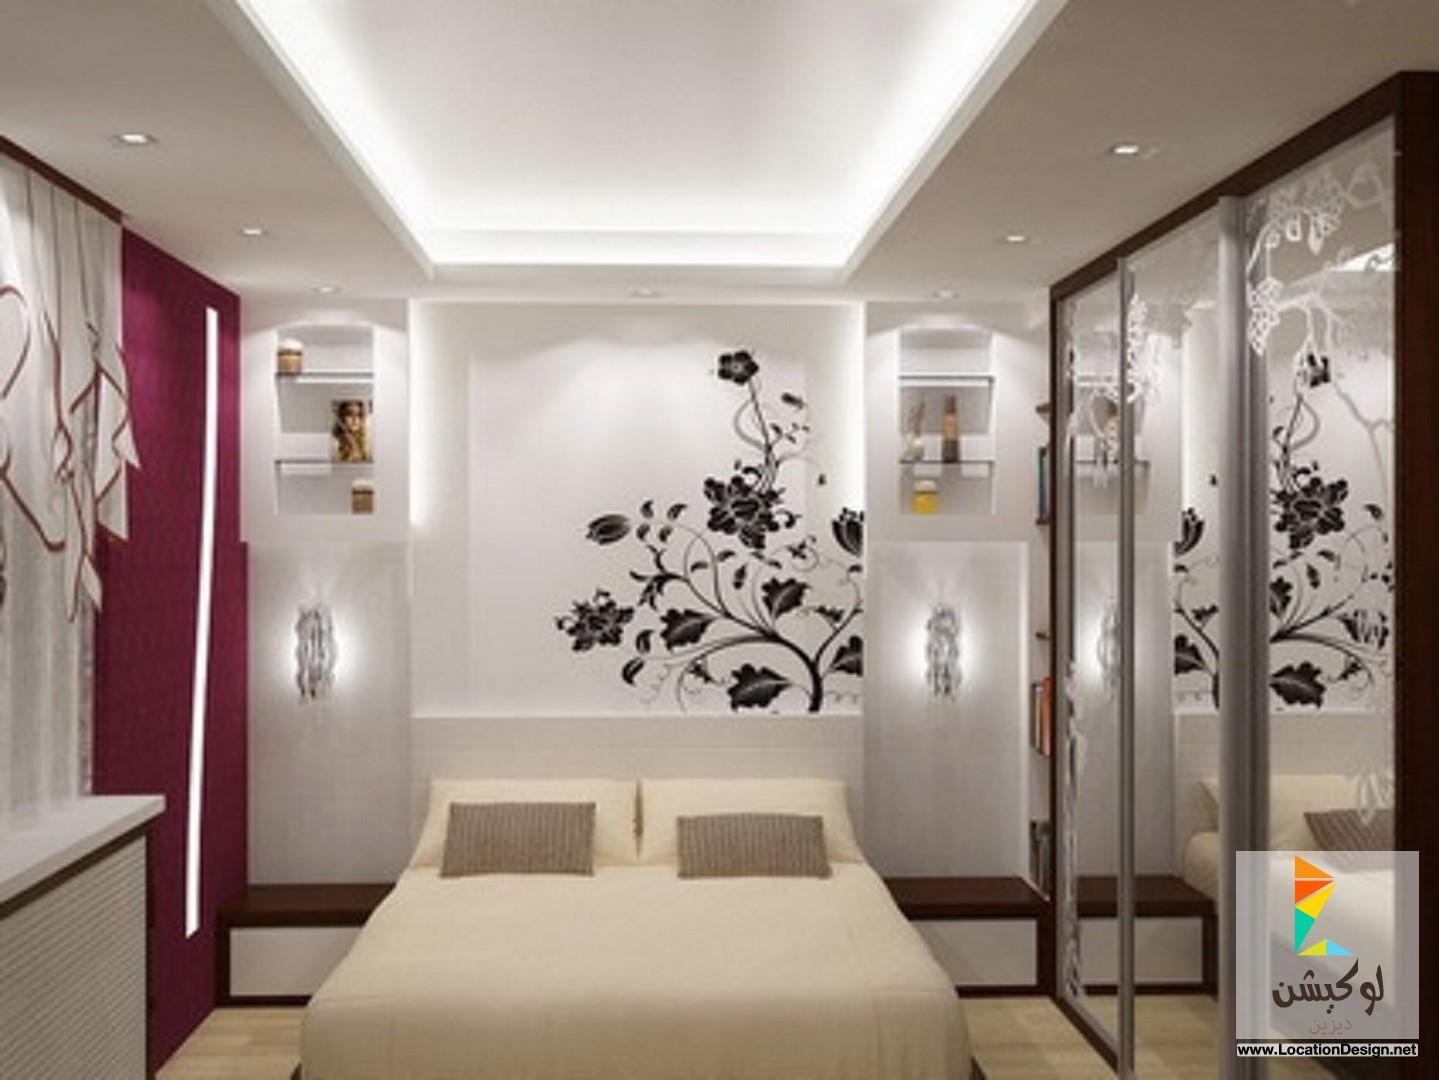 تصاميم ديكور غرف نوم 2017 2018 Bedrooms Egypt